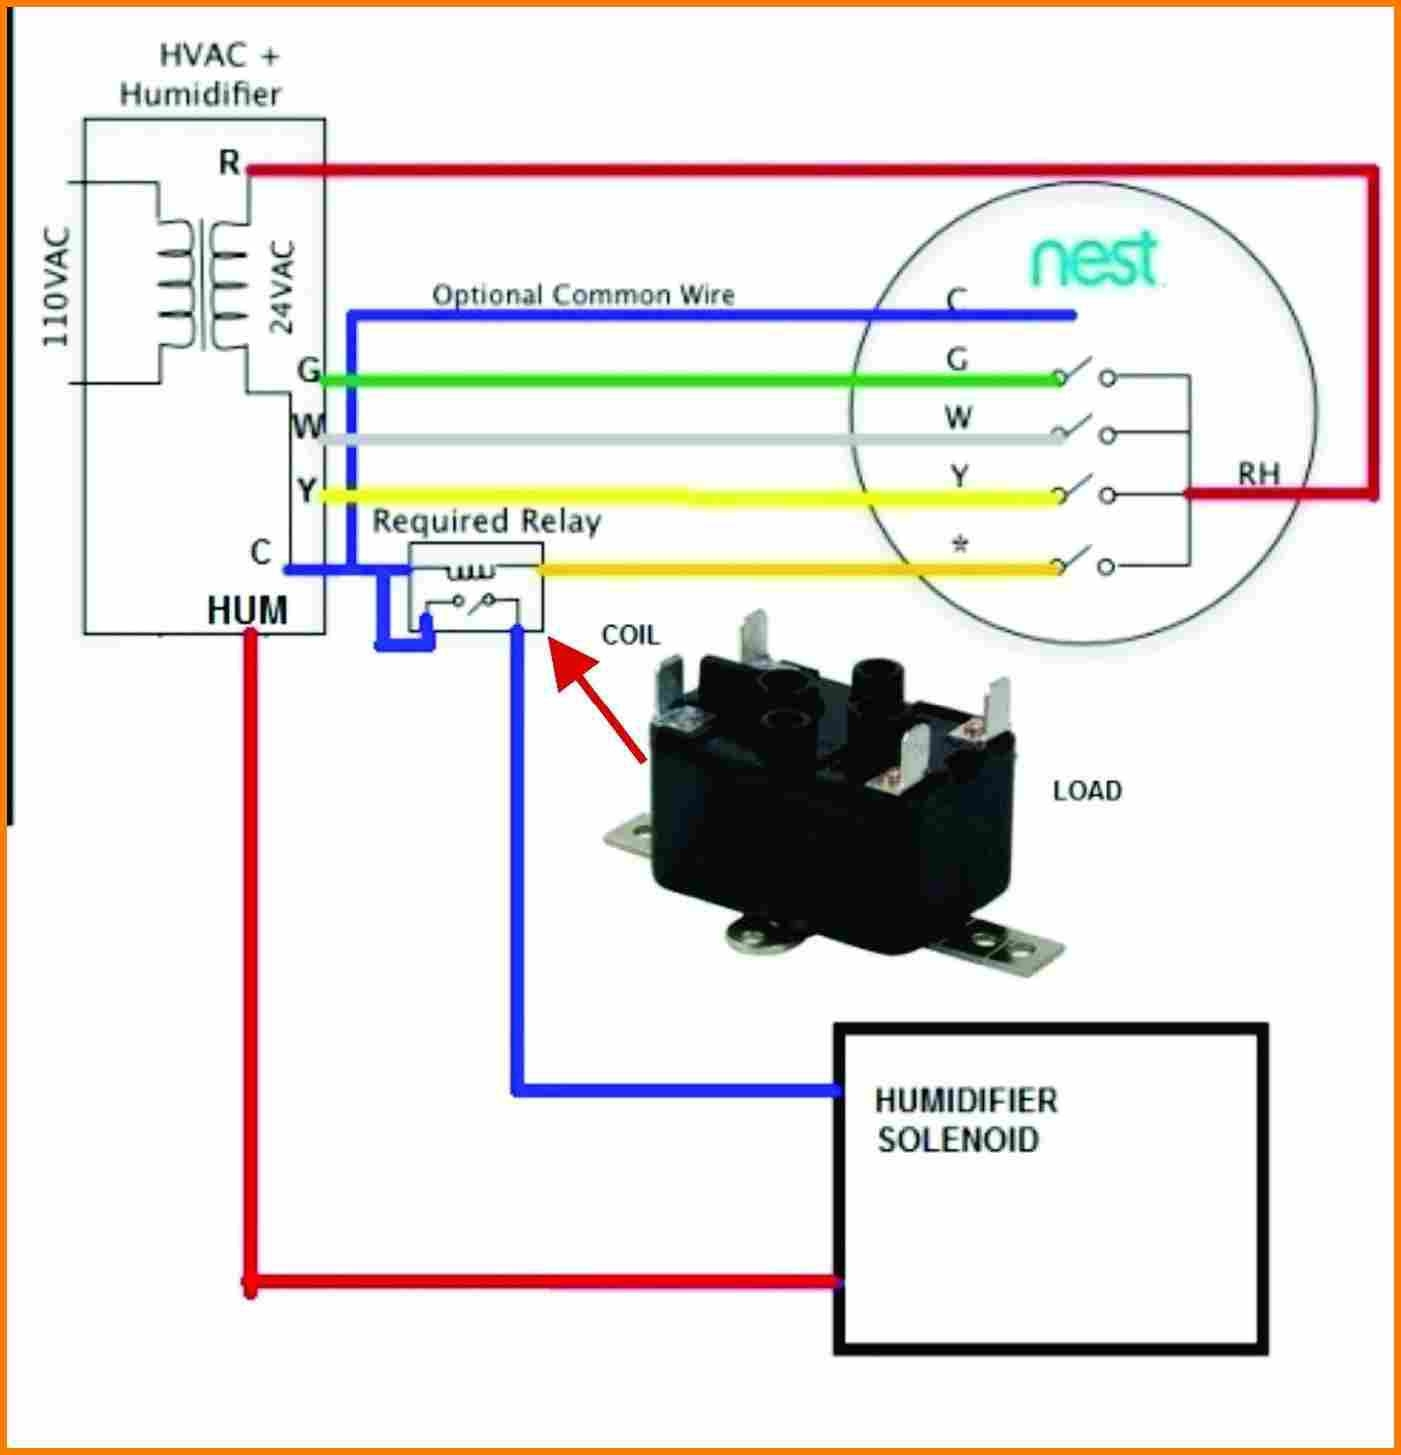 hight resolution of nest c wire diagram wiring diagram library 5 wire nest nest c wire diagram